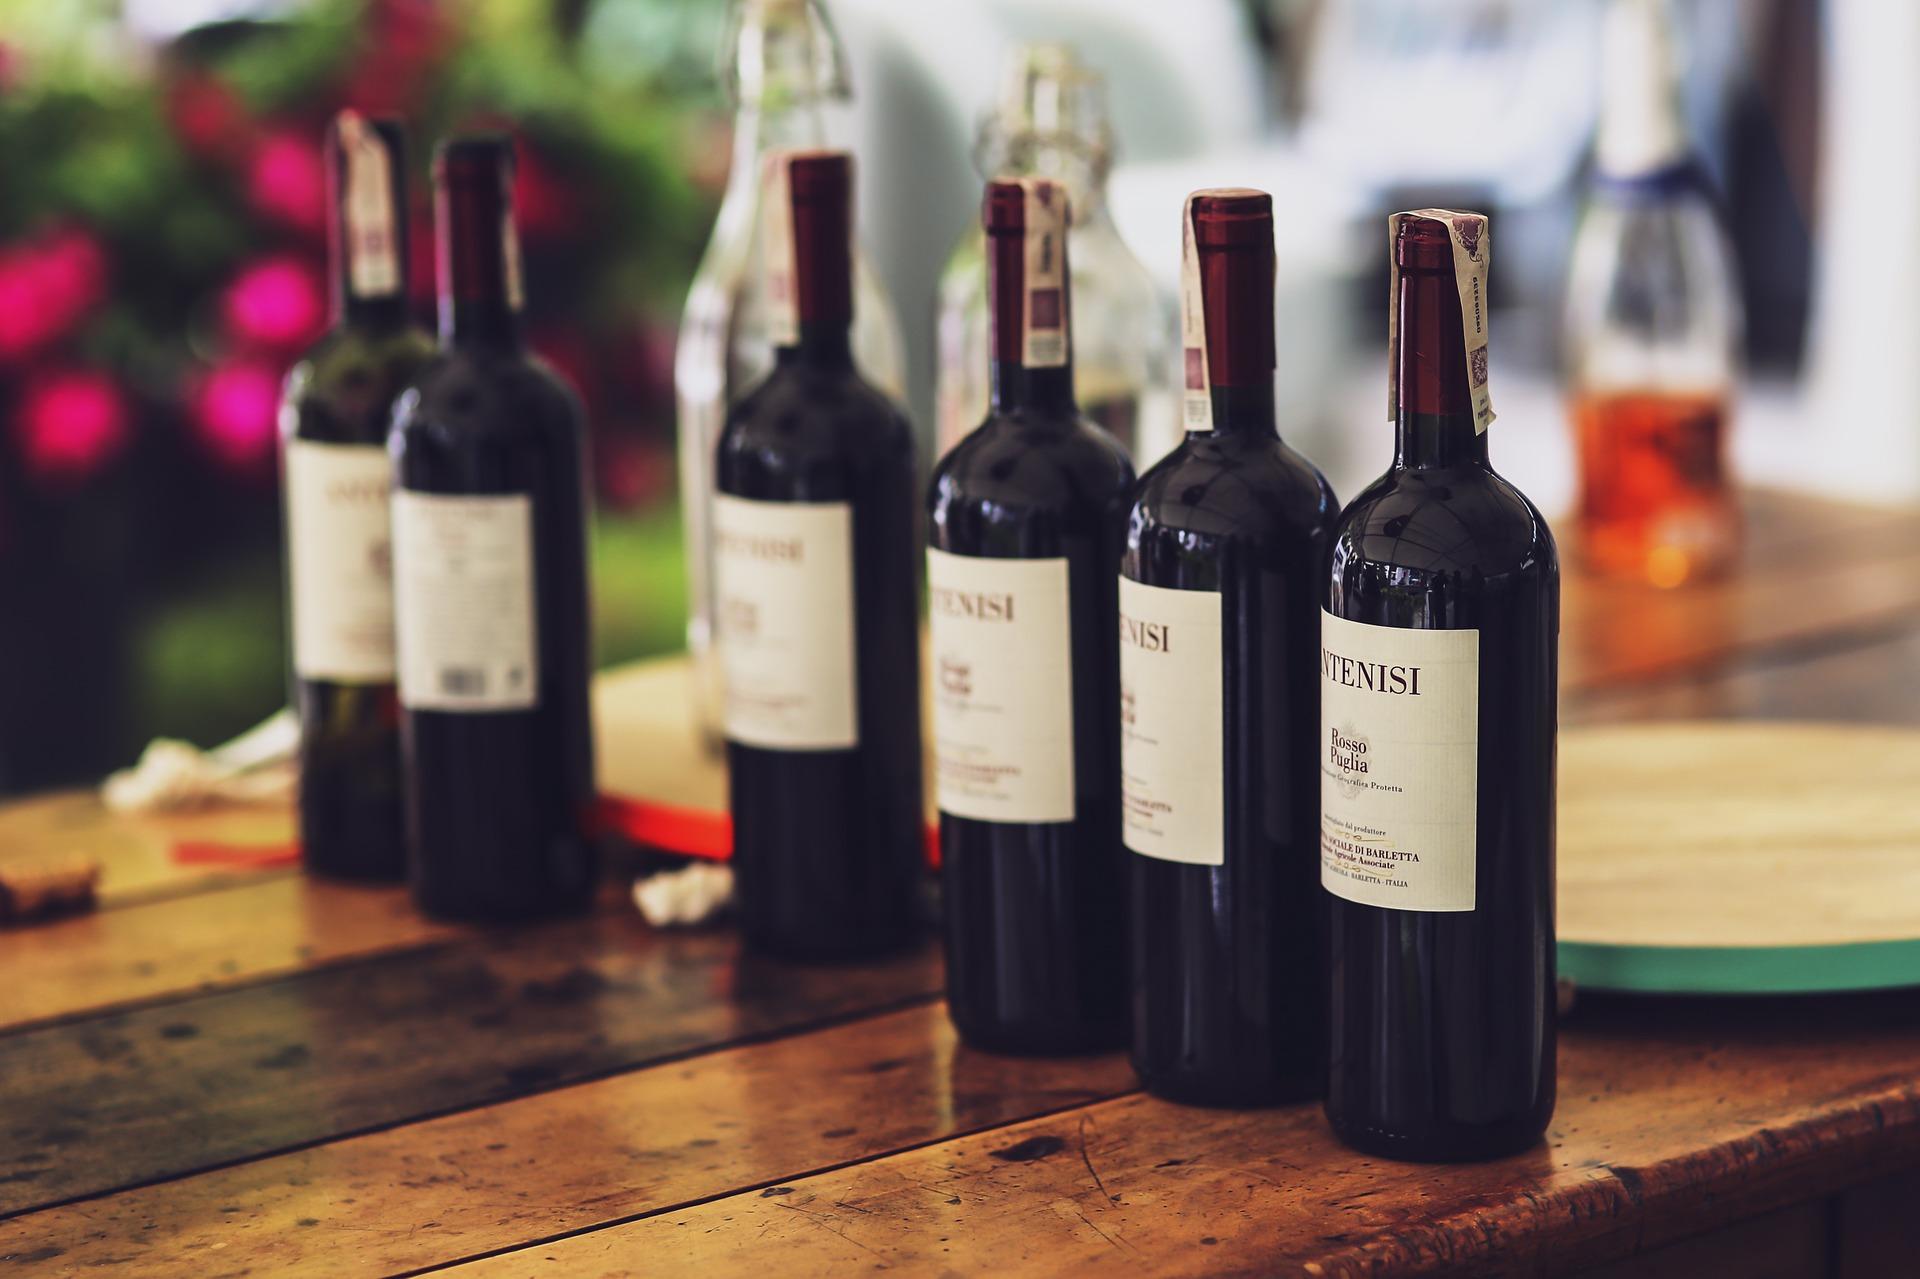 Mediterranean-Cuisine-Origin-Sin-venuerific-blog-restaurant-wine